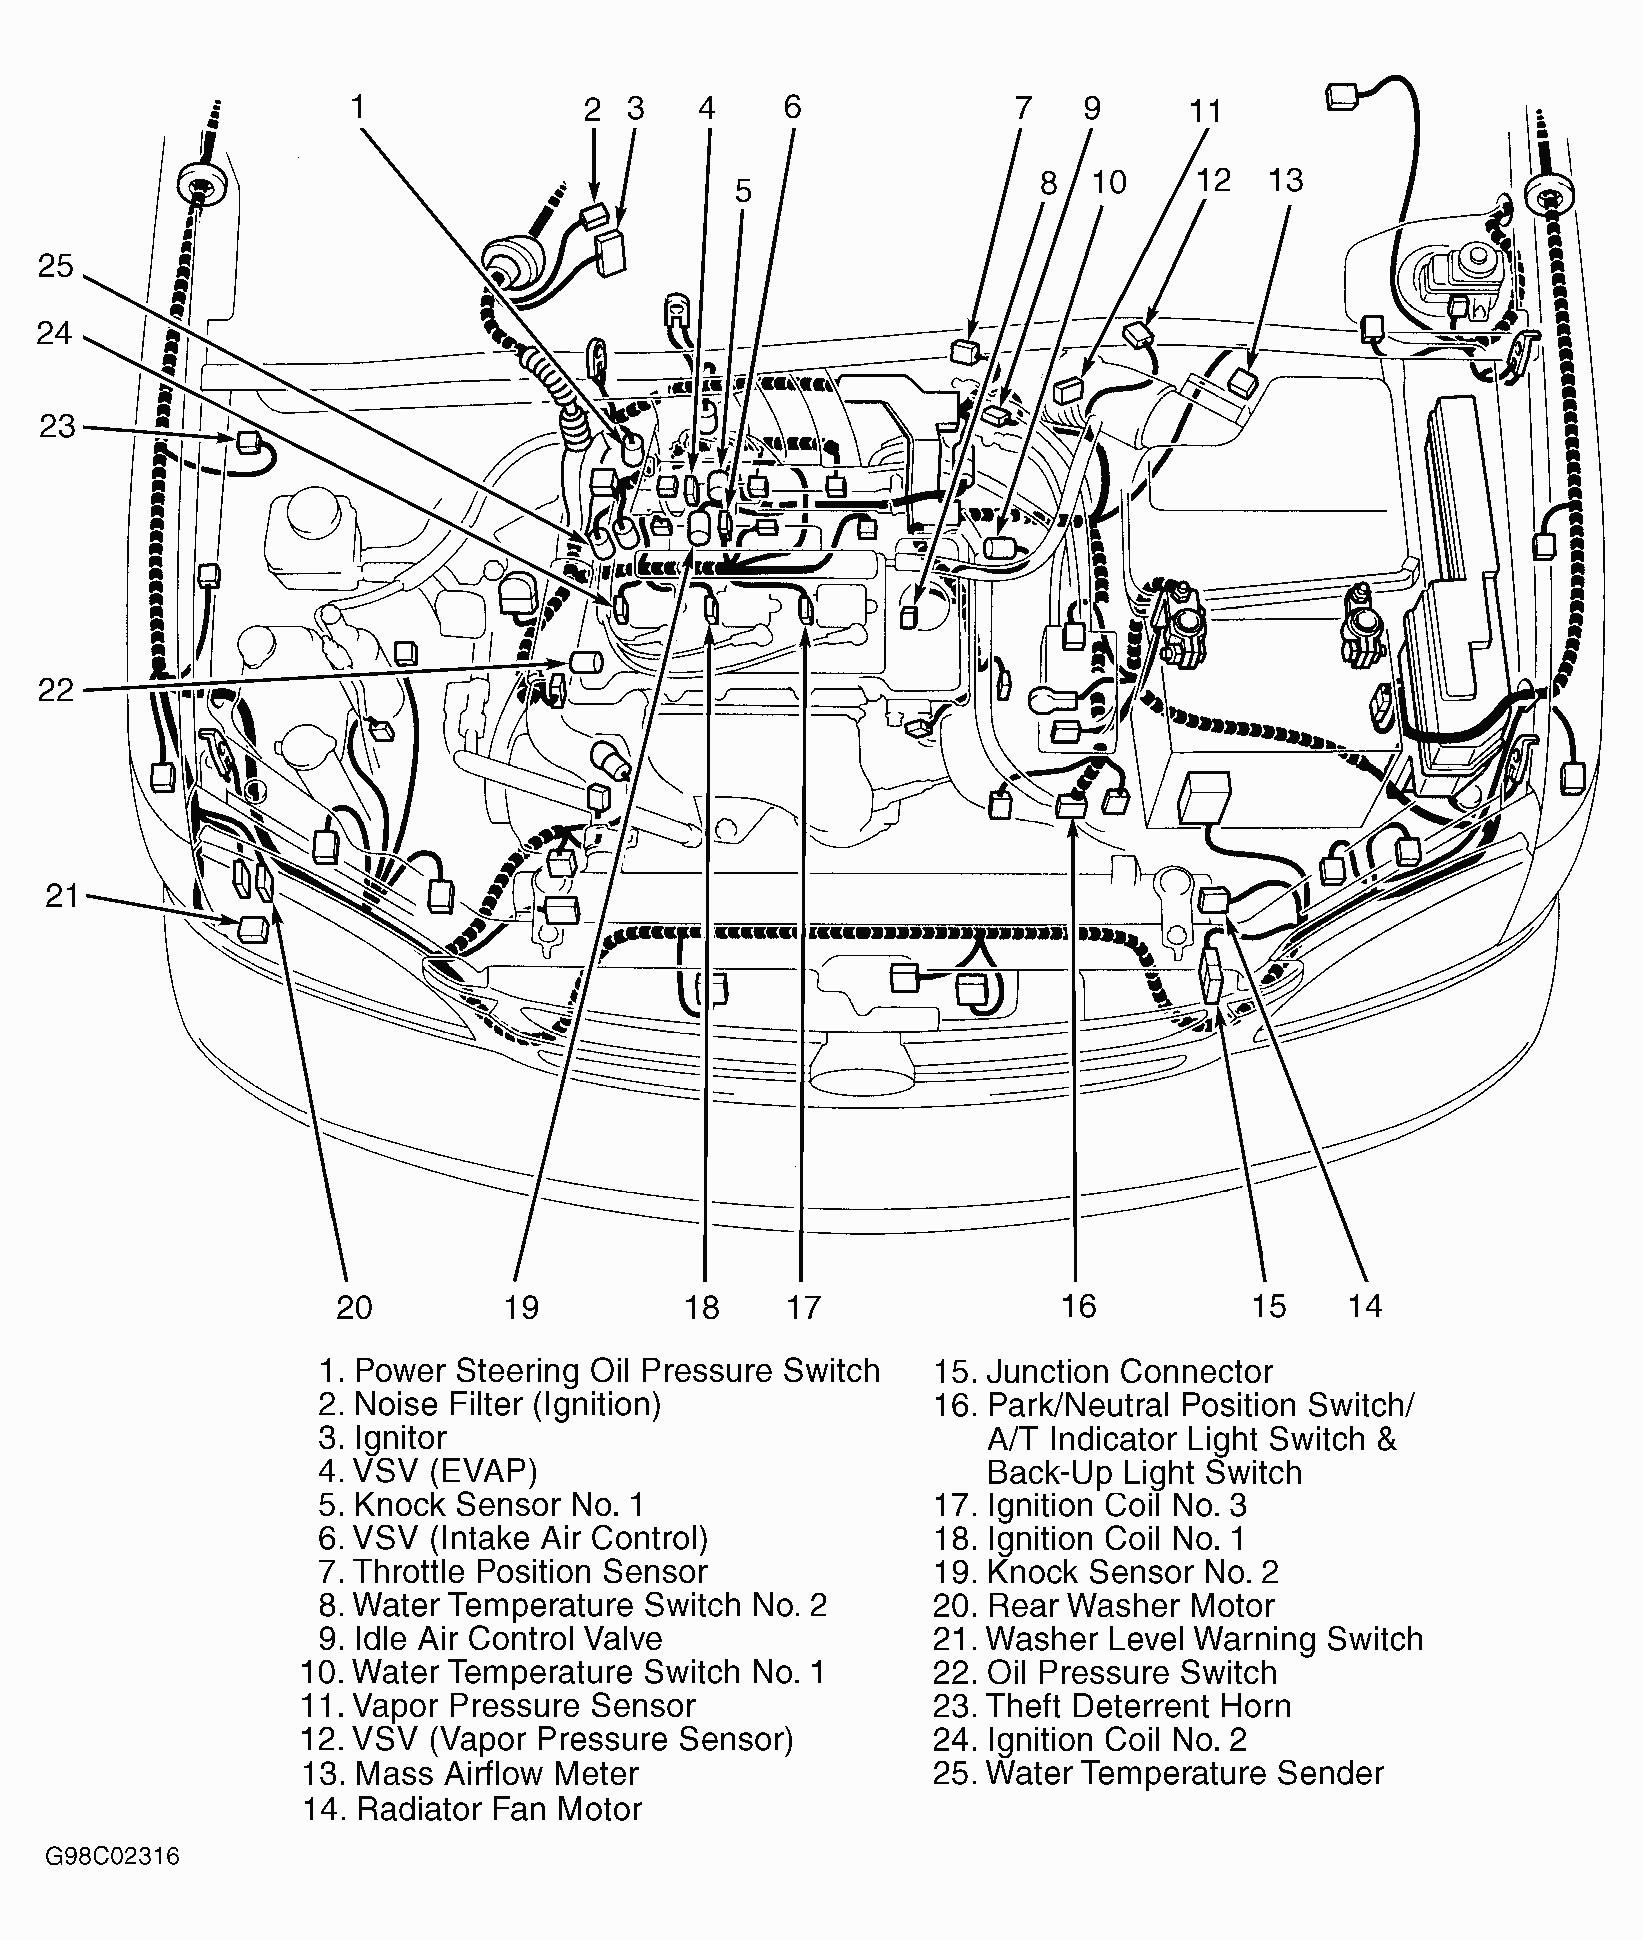 467849 Lexus E300 1995 Wiring Diagram   Wiring LibraryWiring Library